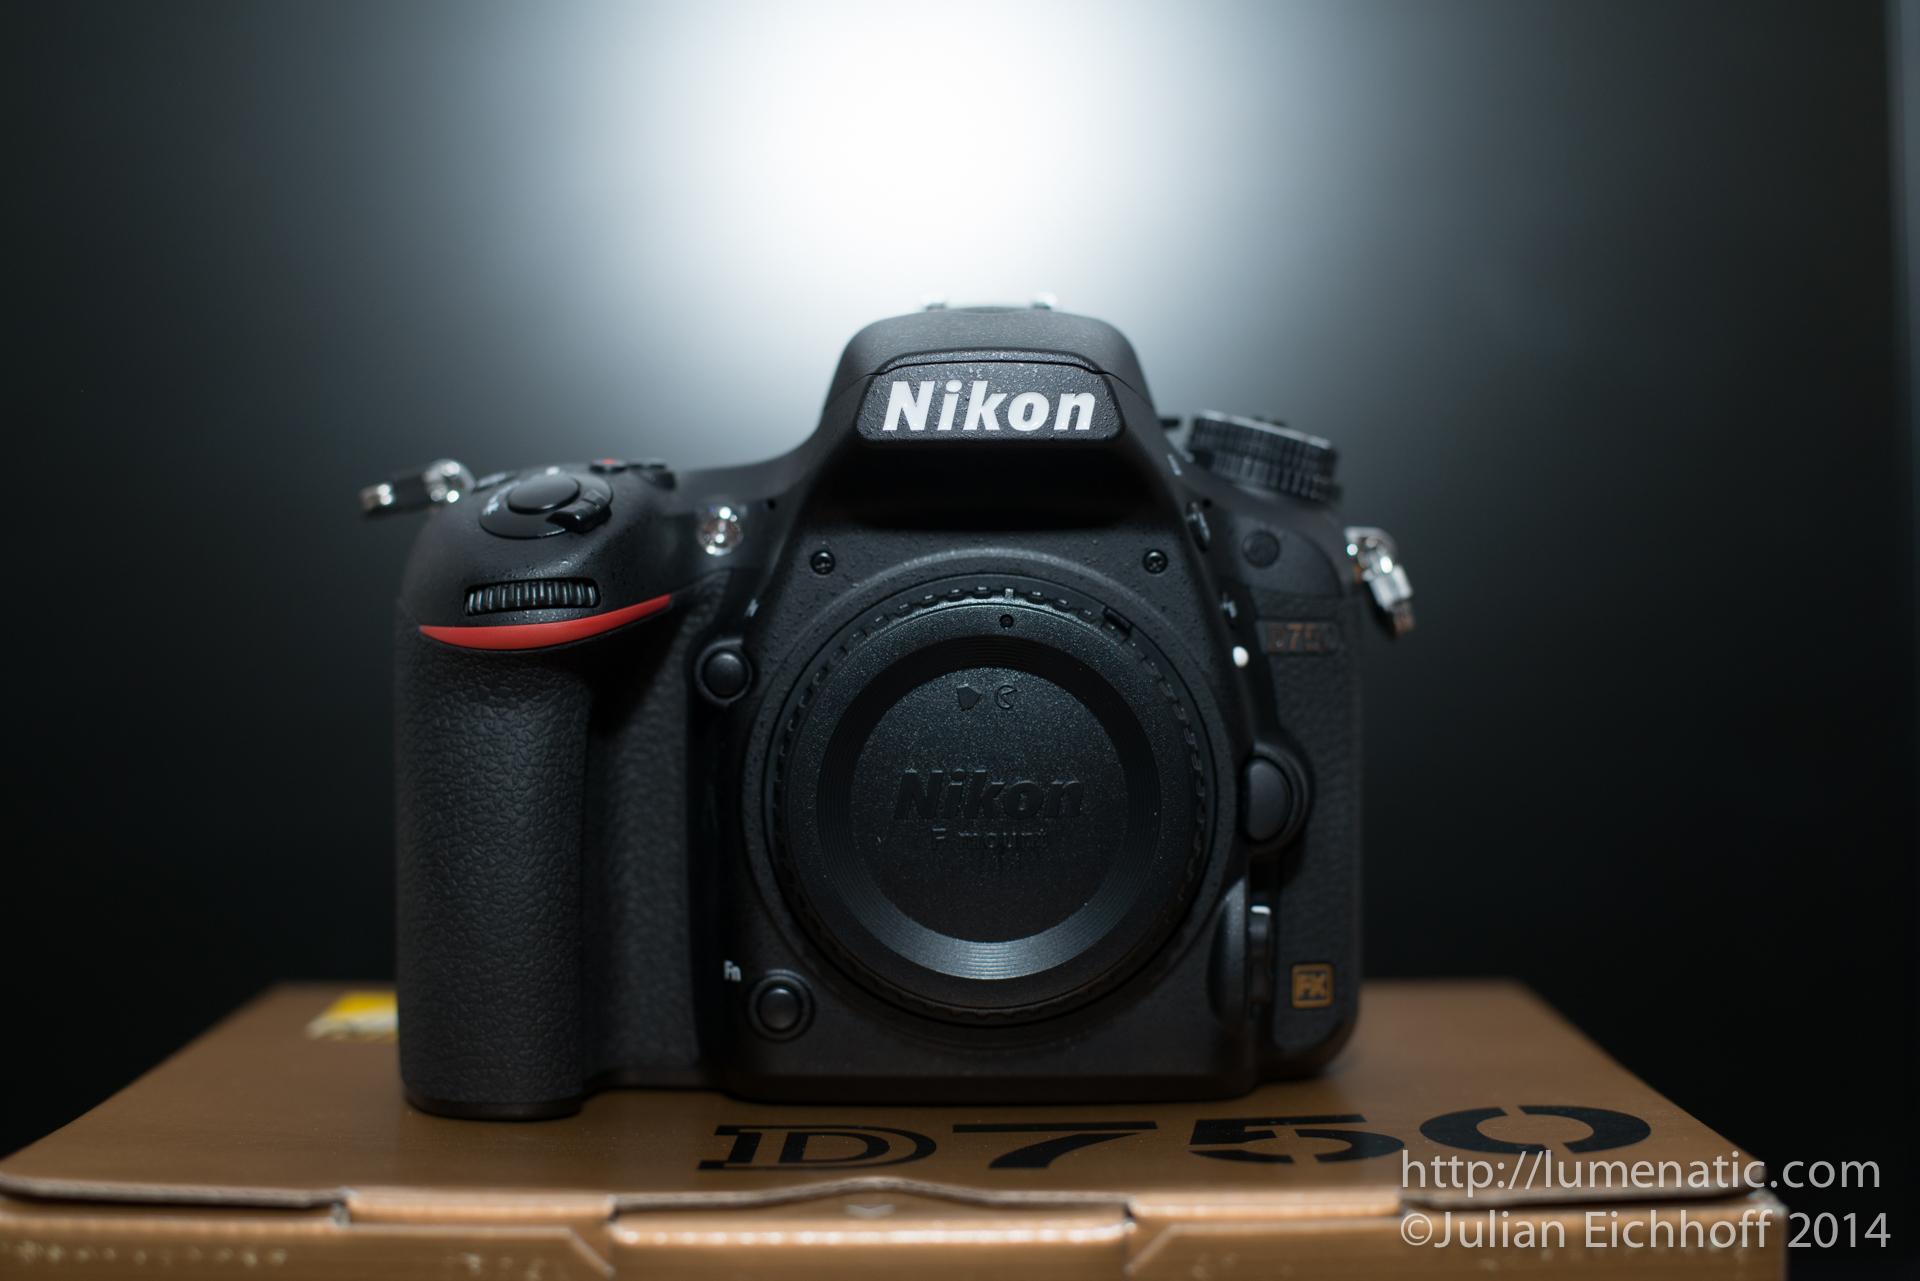 The Nikon D750 has arrived